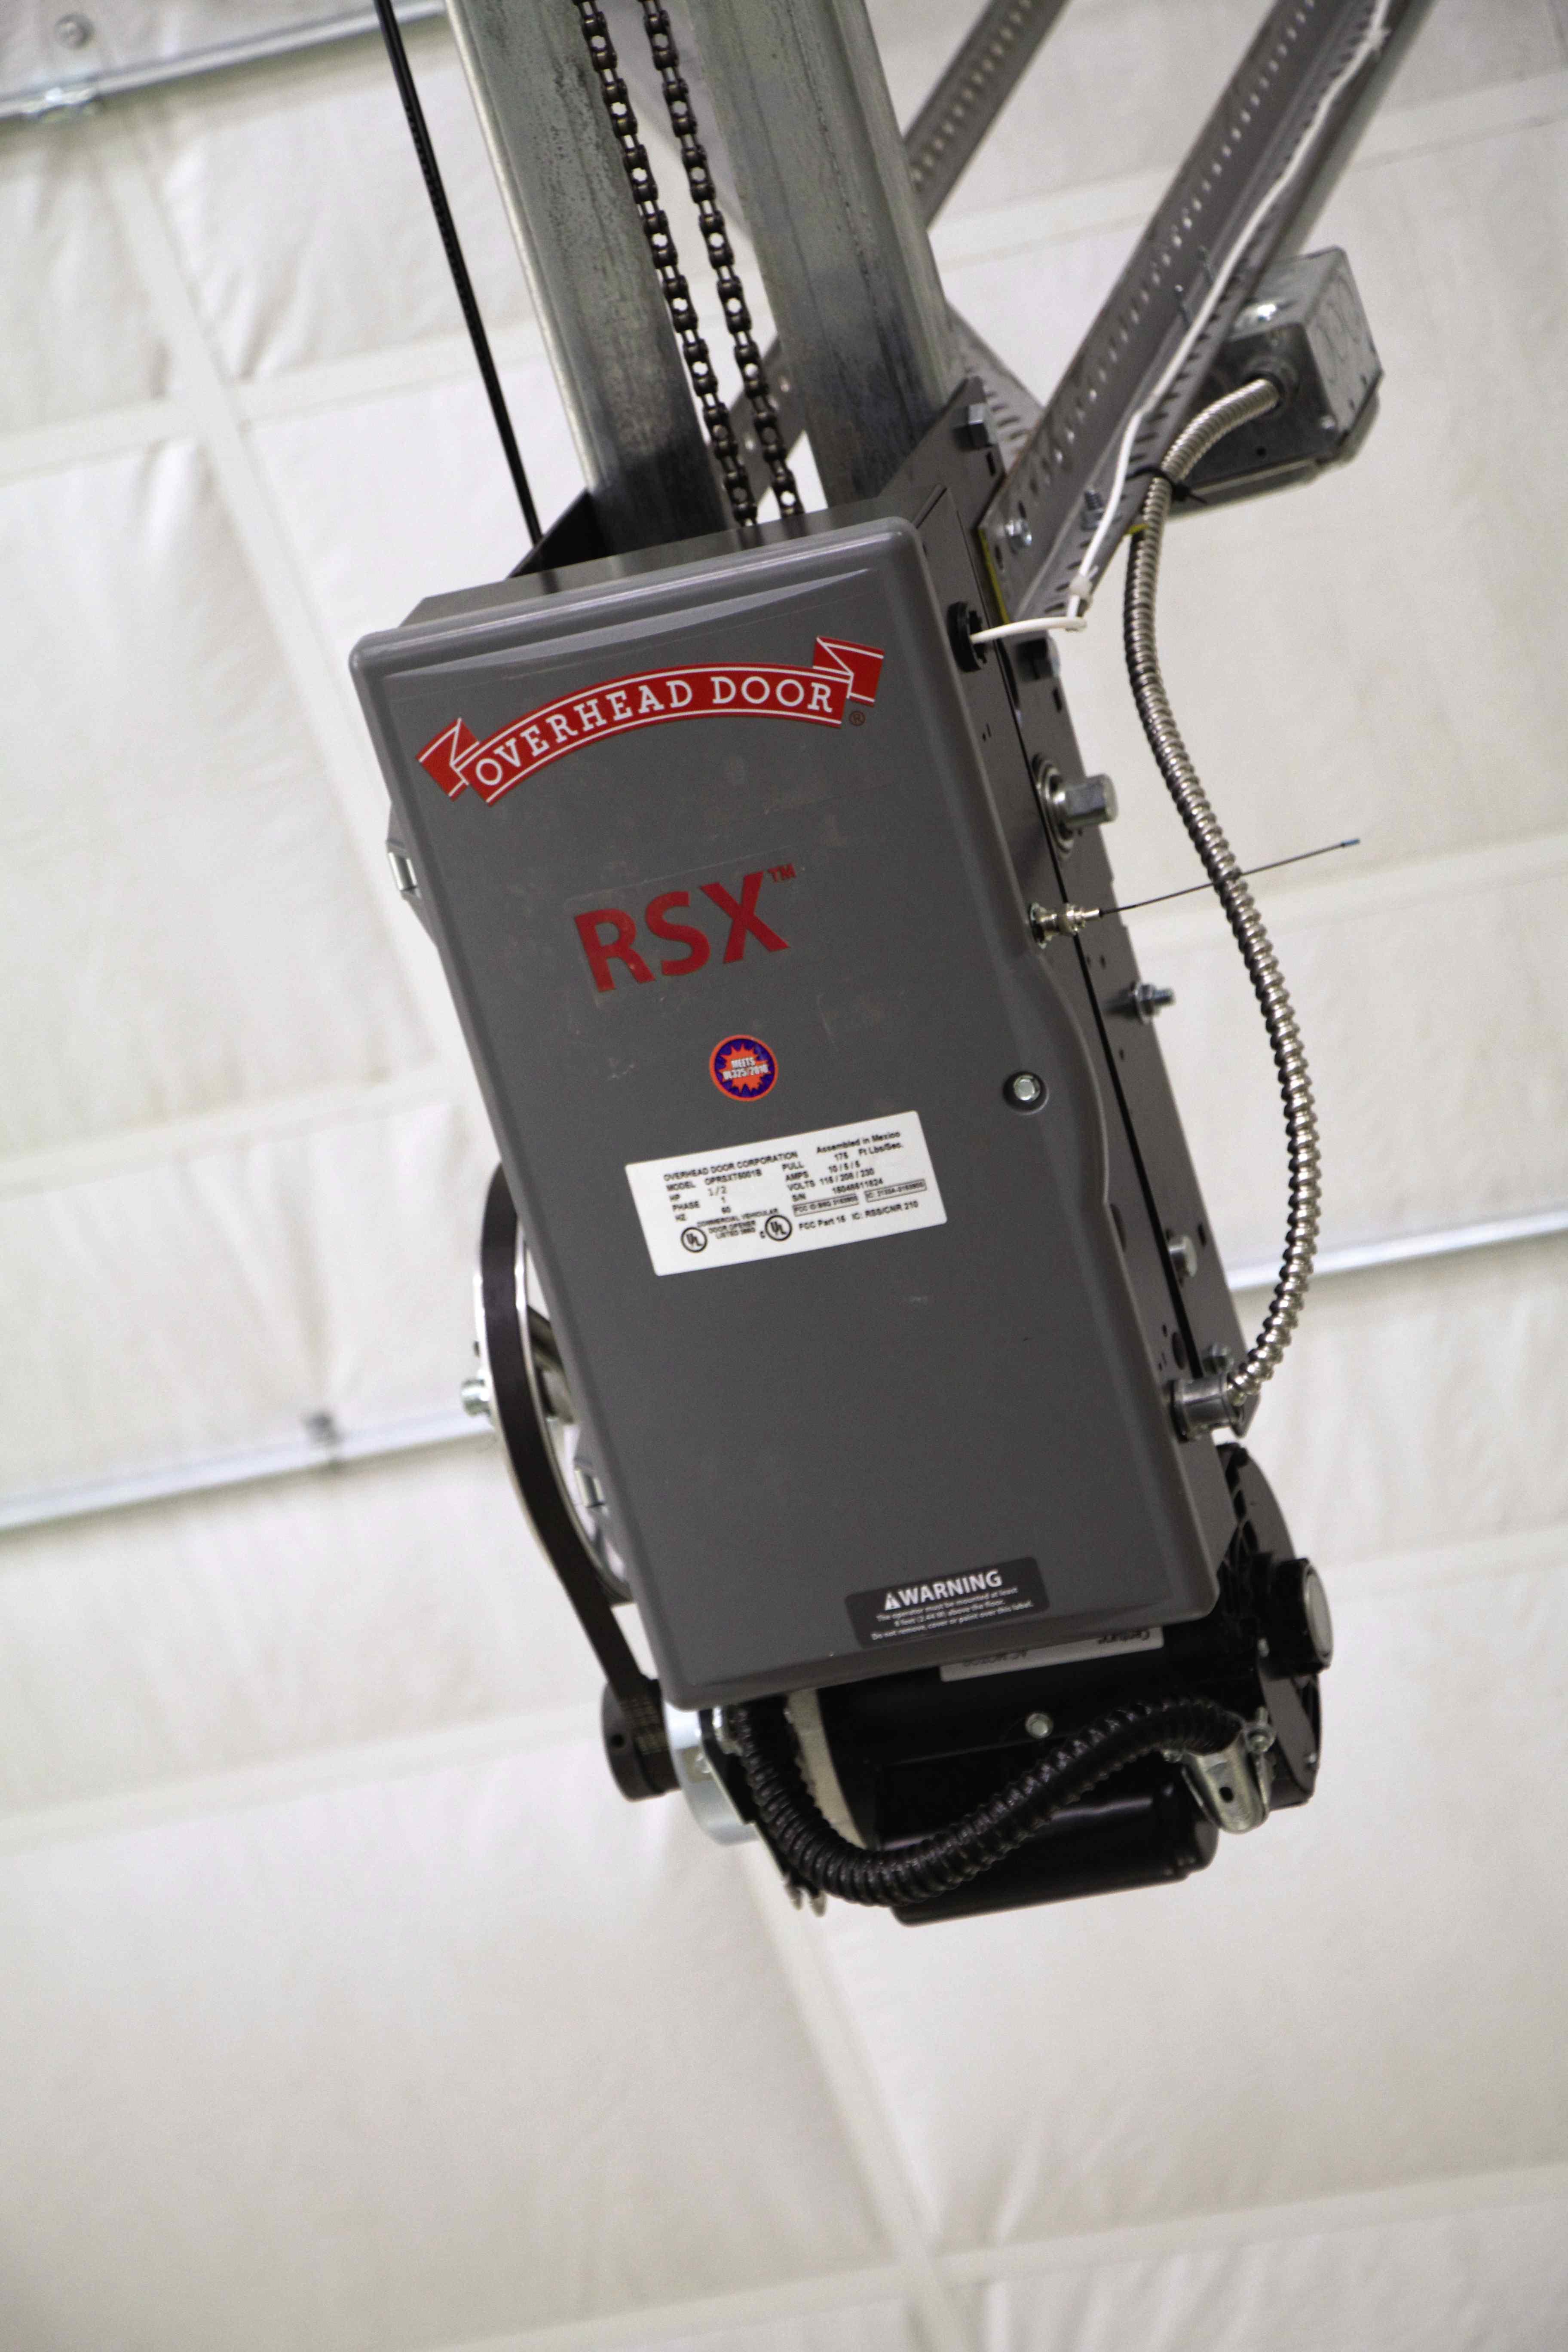 Overhead Door Rsx Parts Genie Pro Max Circuit Board Wiring Diagram